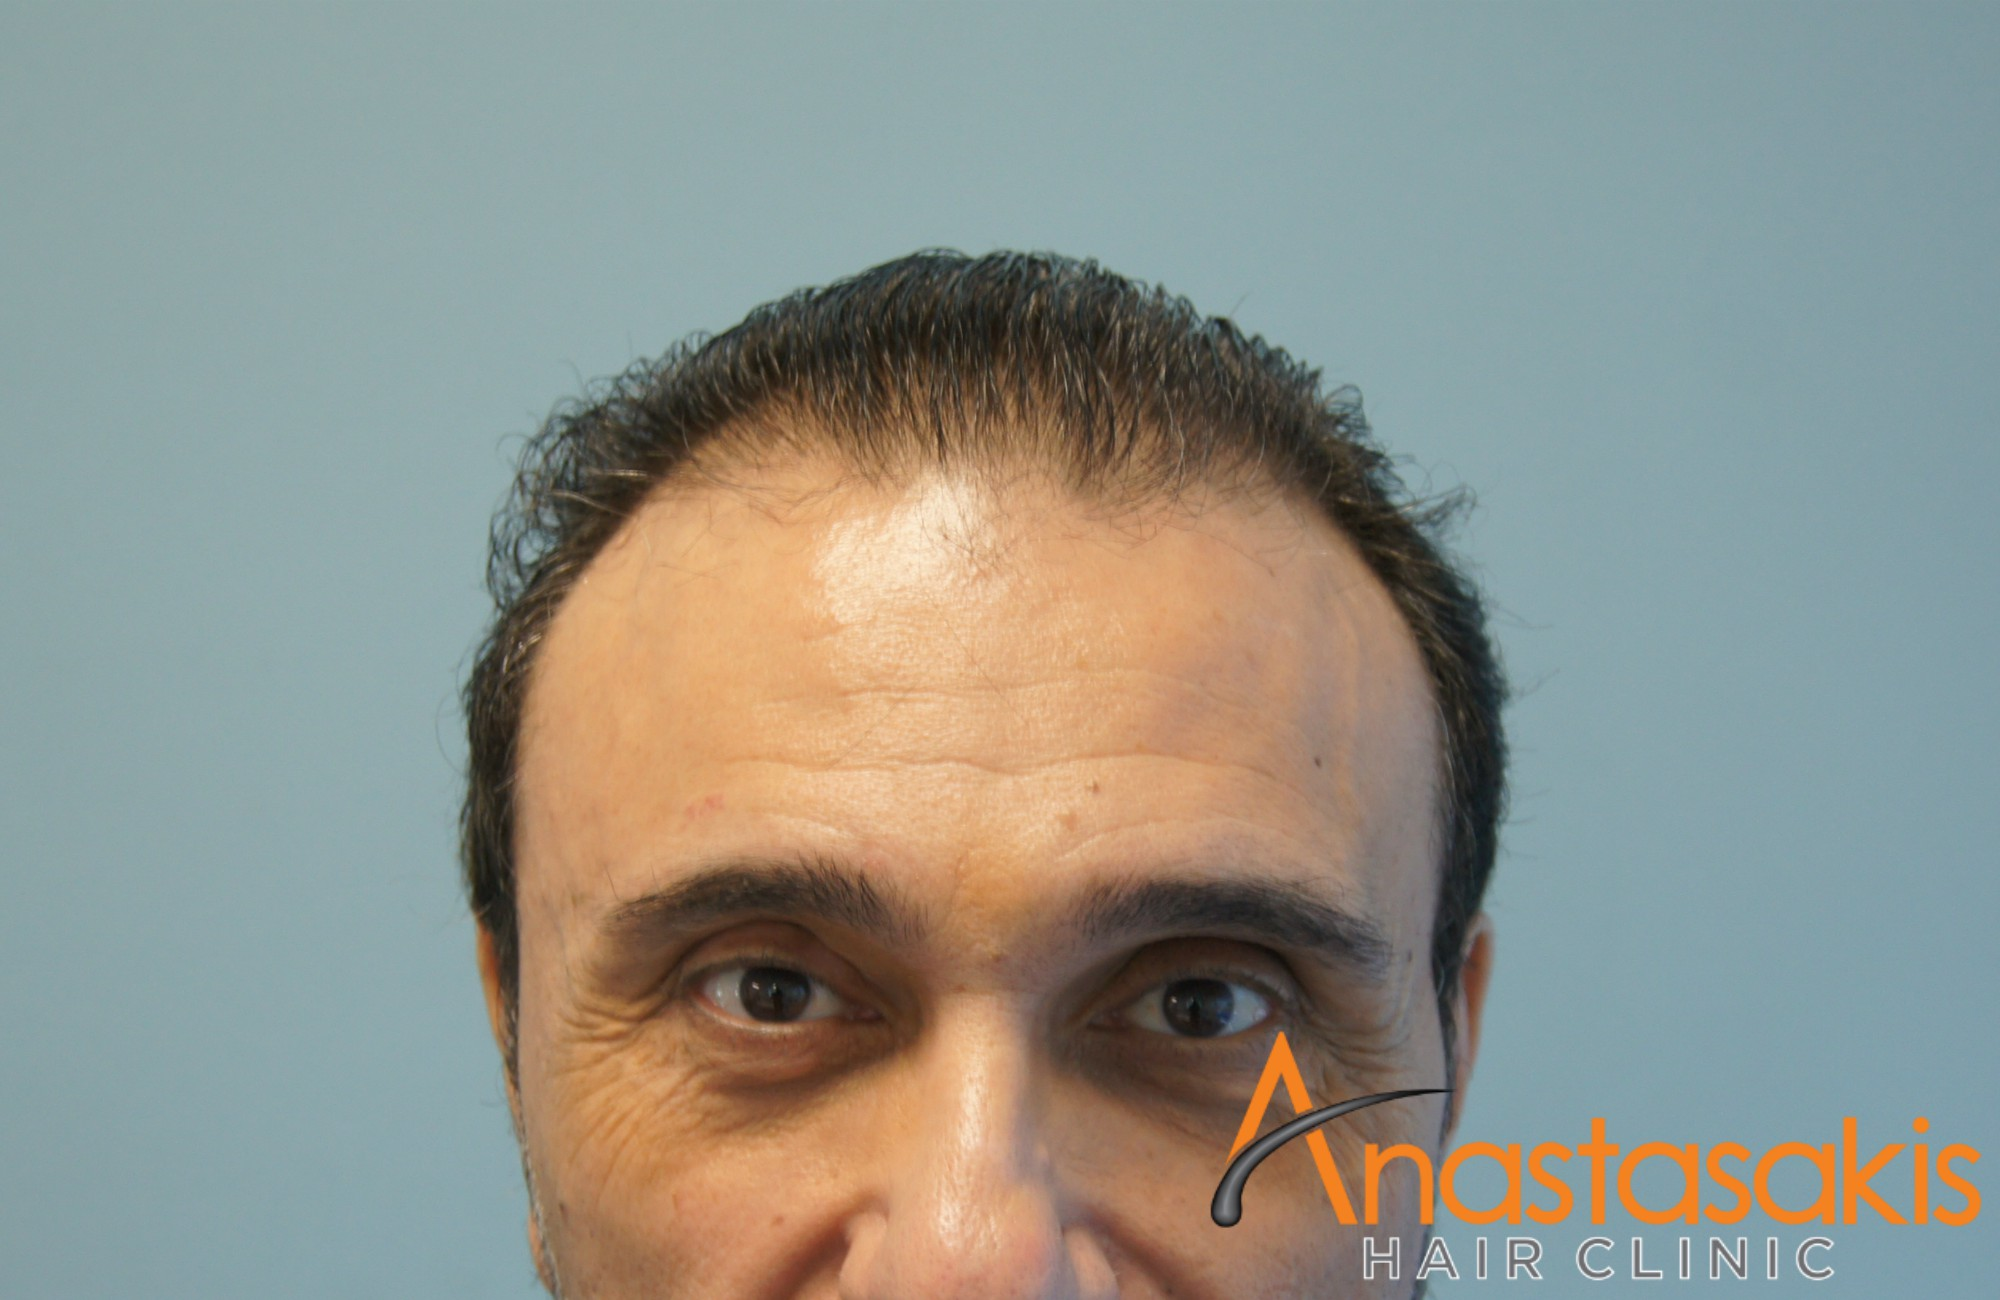 hairline αλεκος ζαζοπουλος πριν τη μεταμοσχευση μαλλιων με 2500 fus